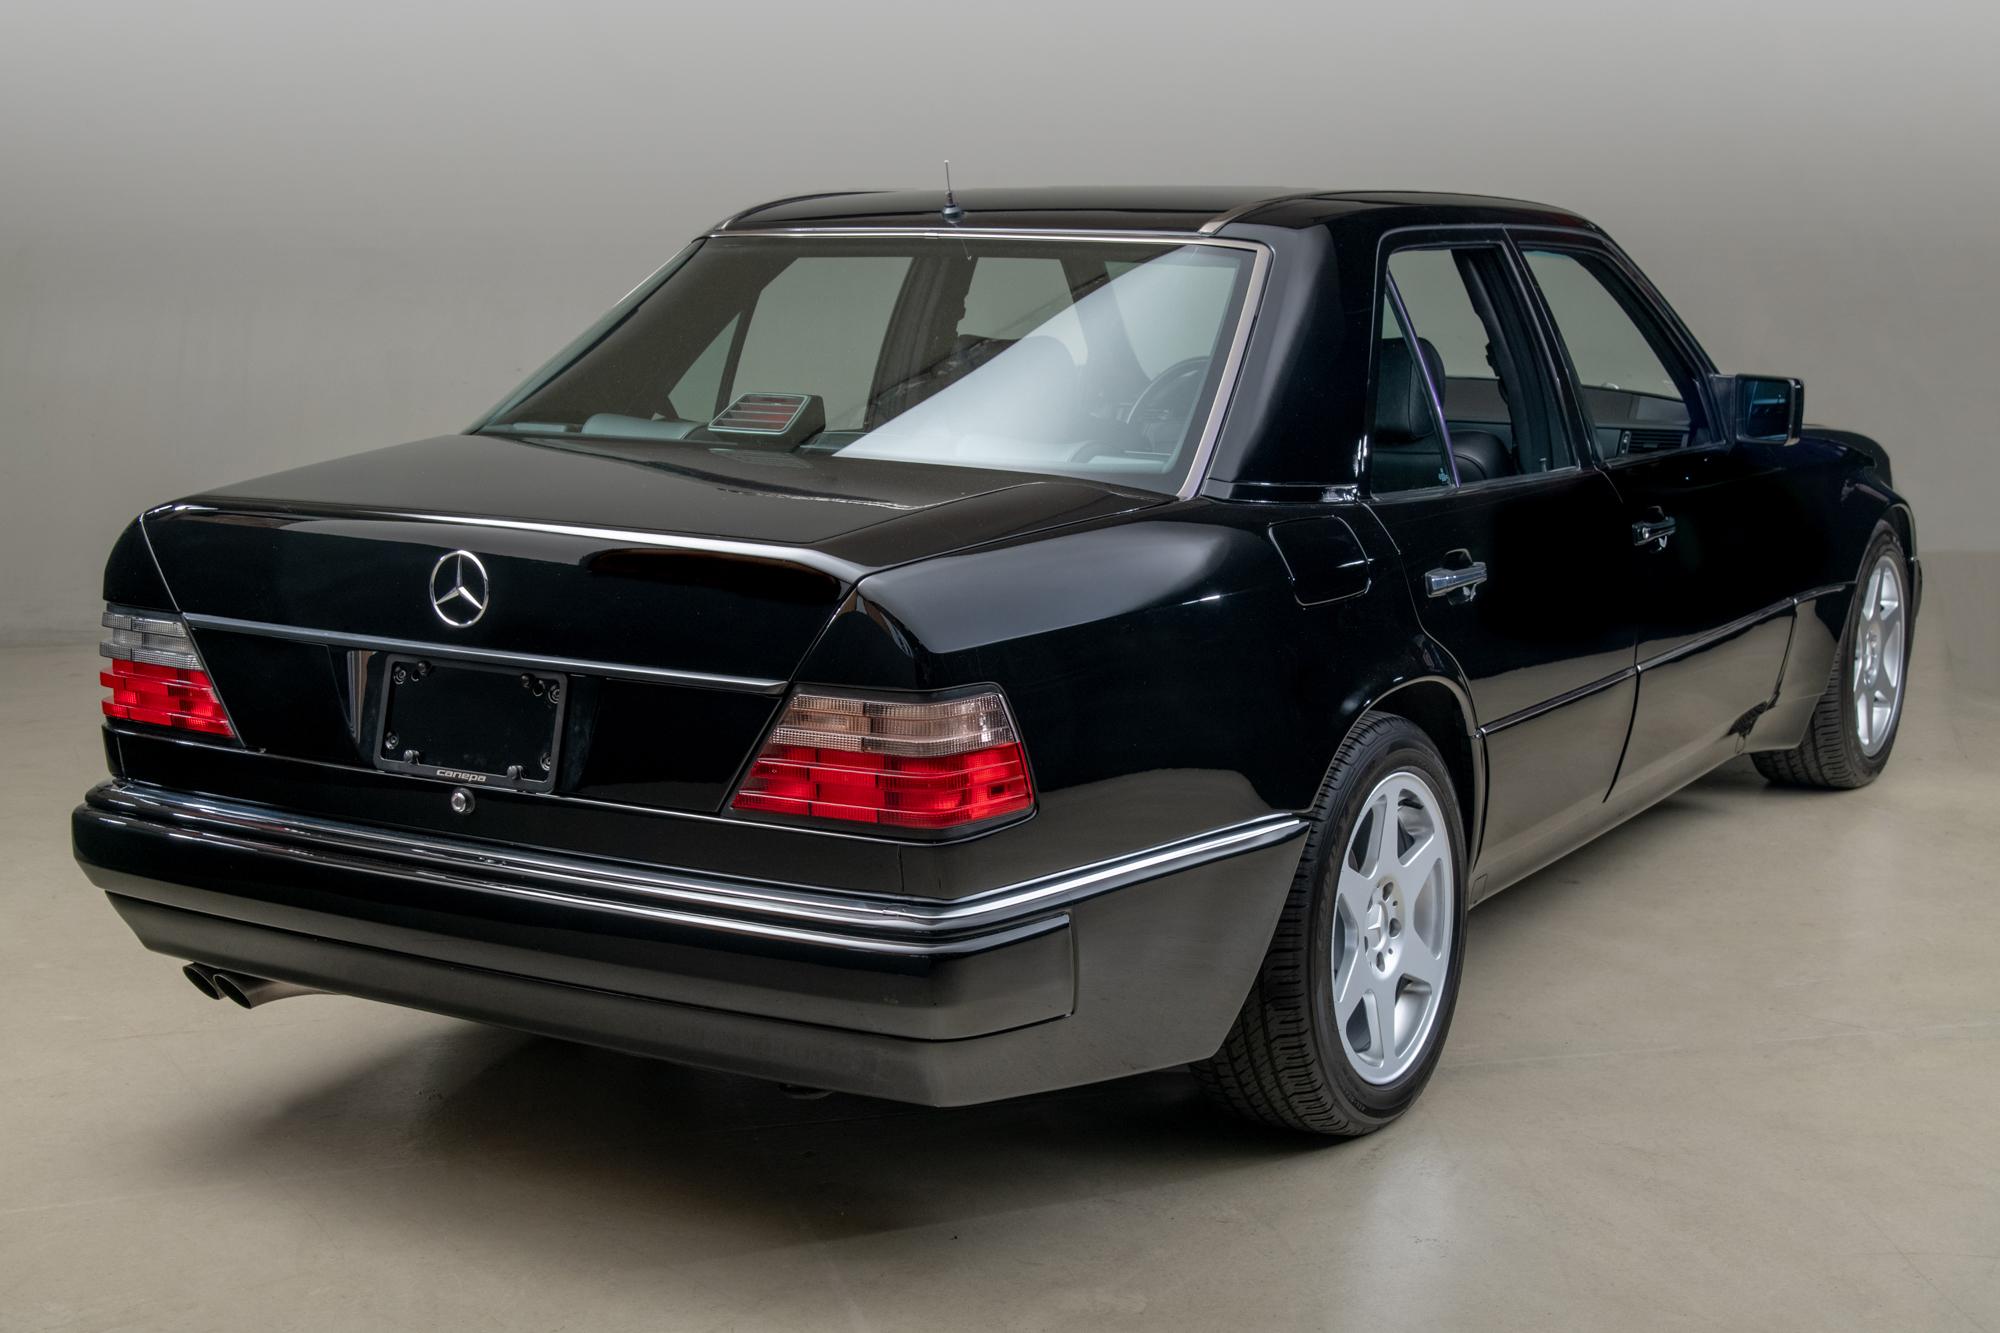 1992 Mercedes-Benz 500E , BLACK, VIN WDBEA36EXNB727308, MILEAGE 74147